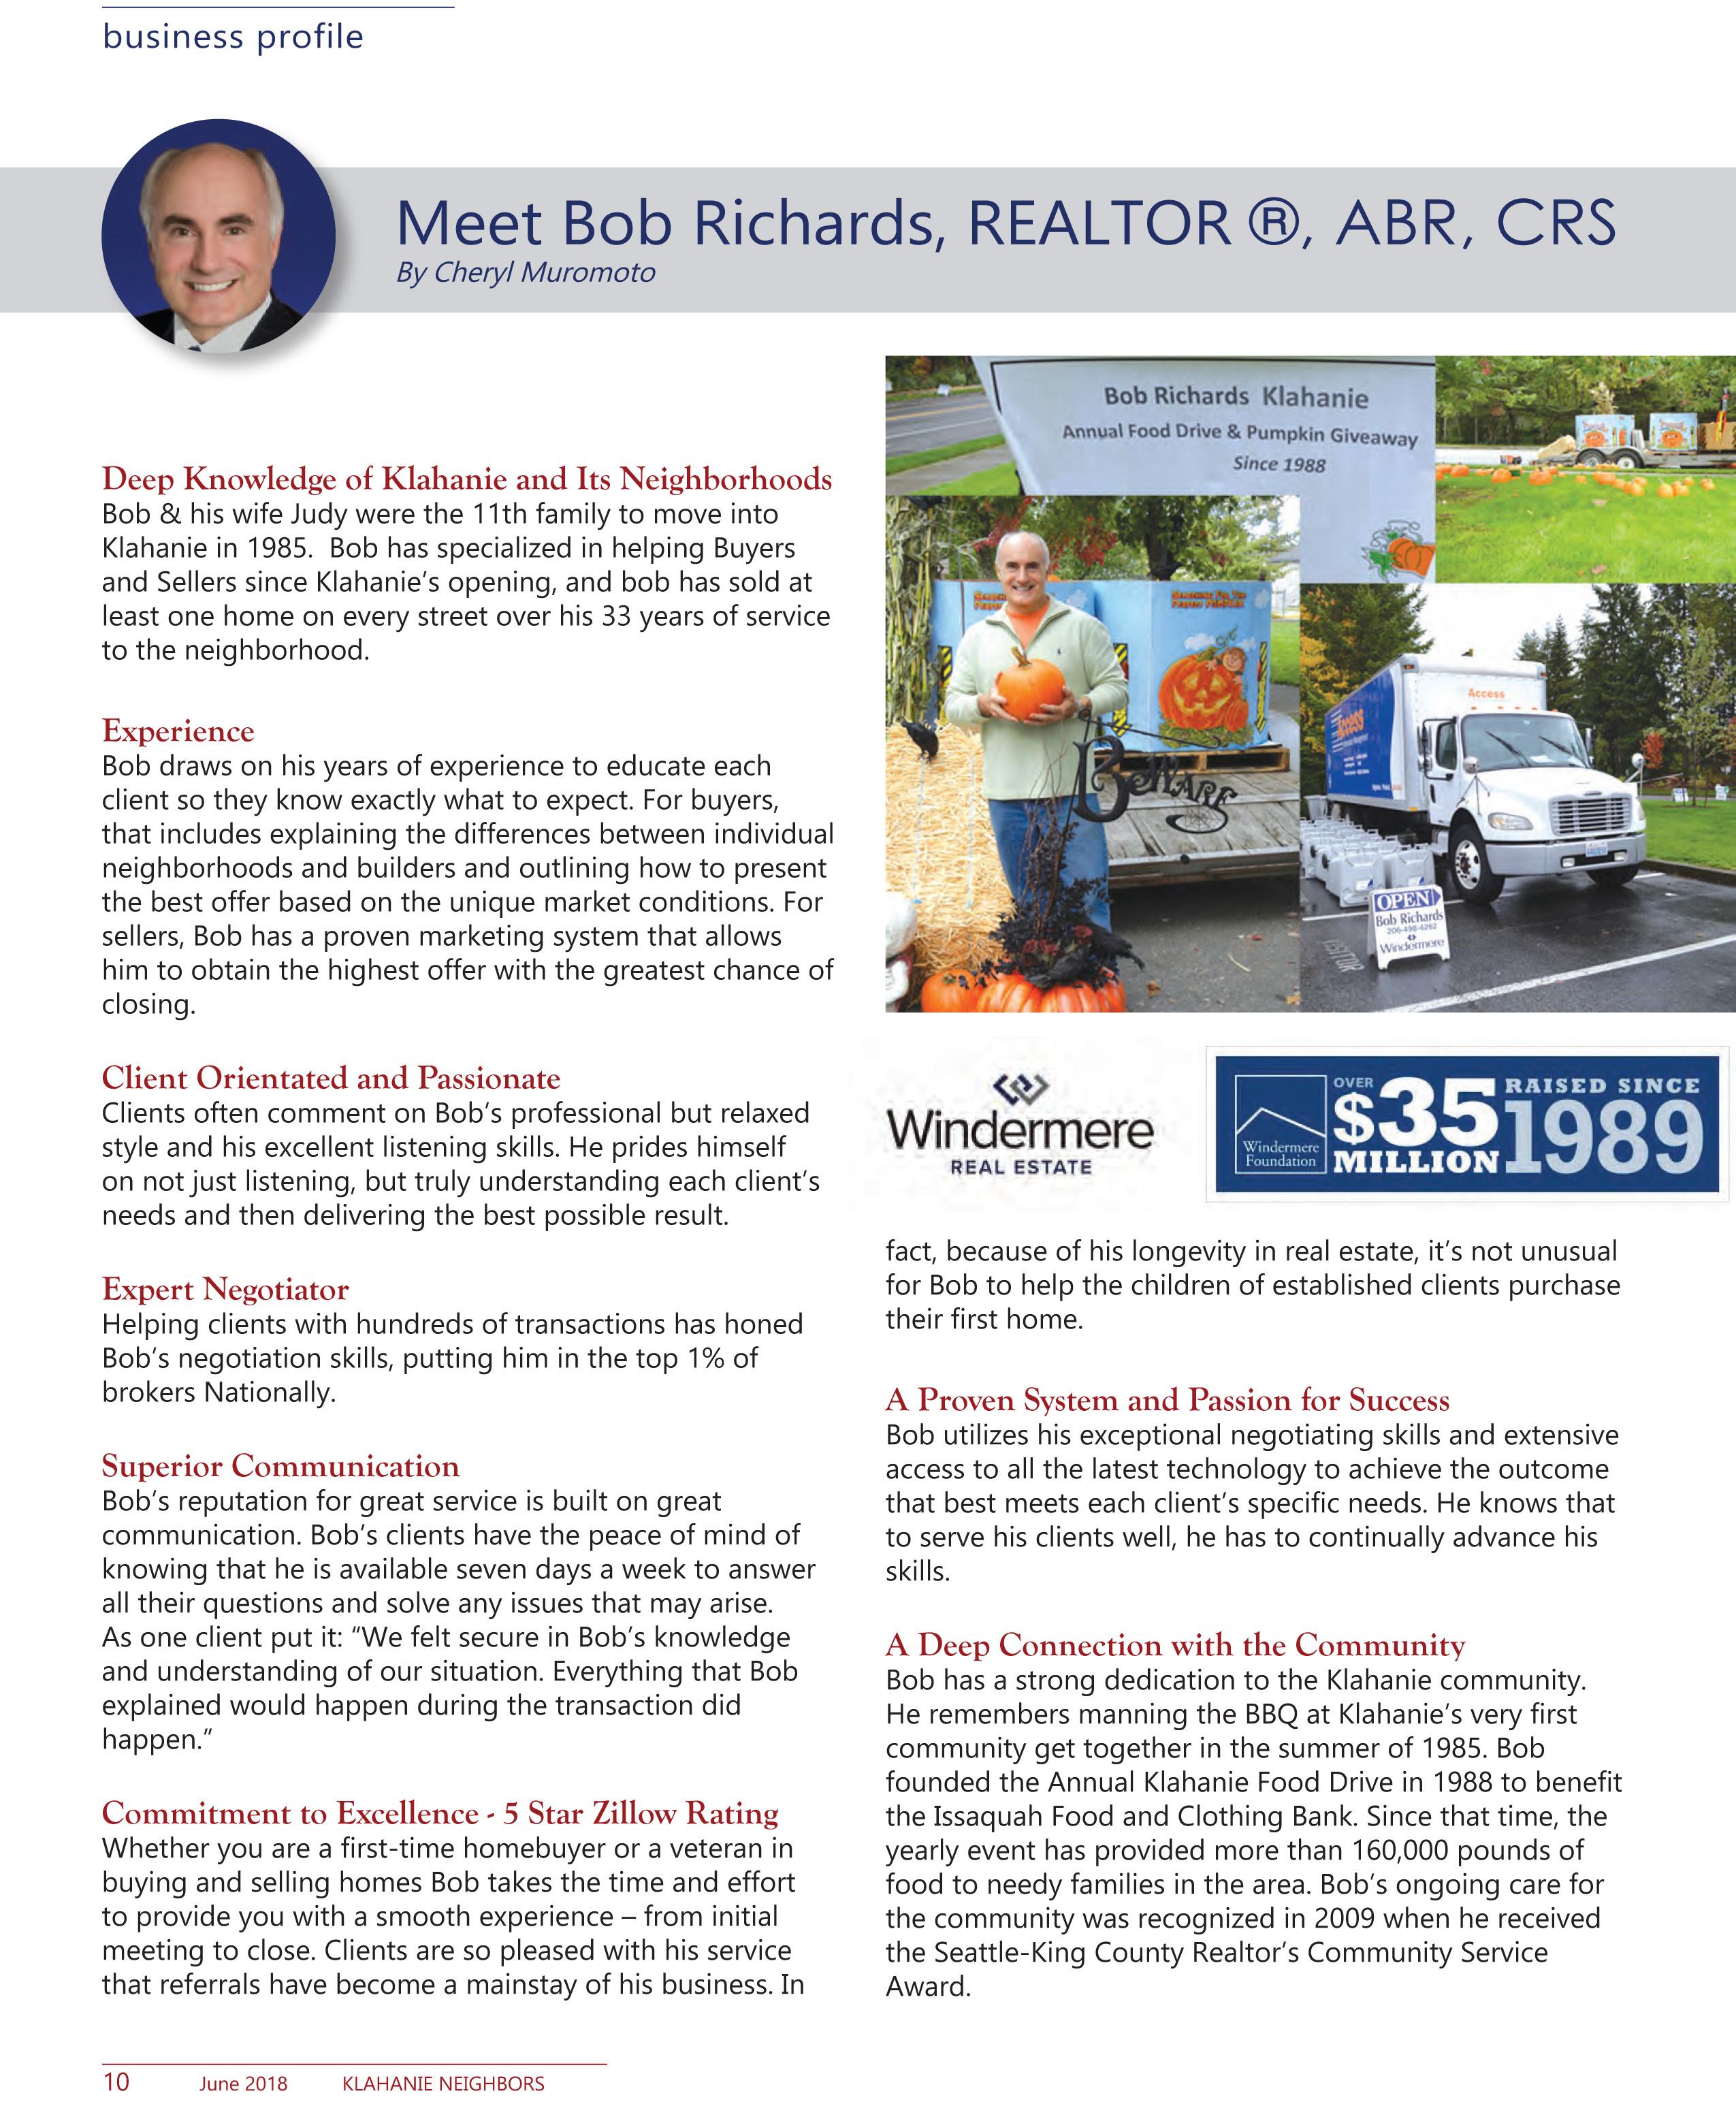 KlahanieNeighbors_BusinessProfile_Bob Richards_June2018pdfsm-1